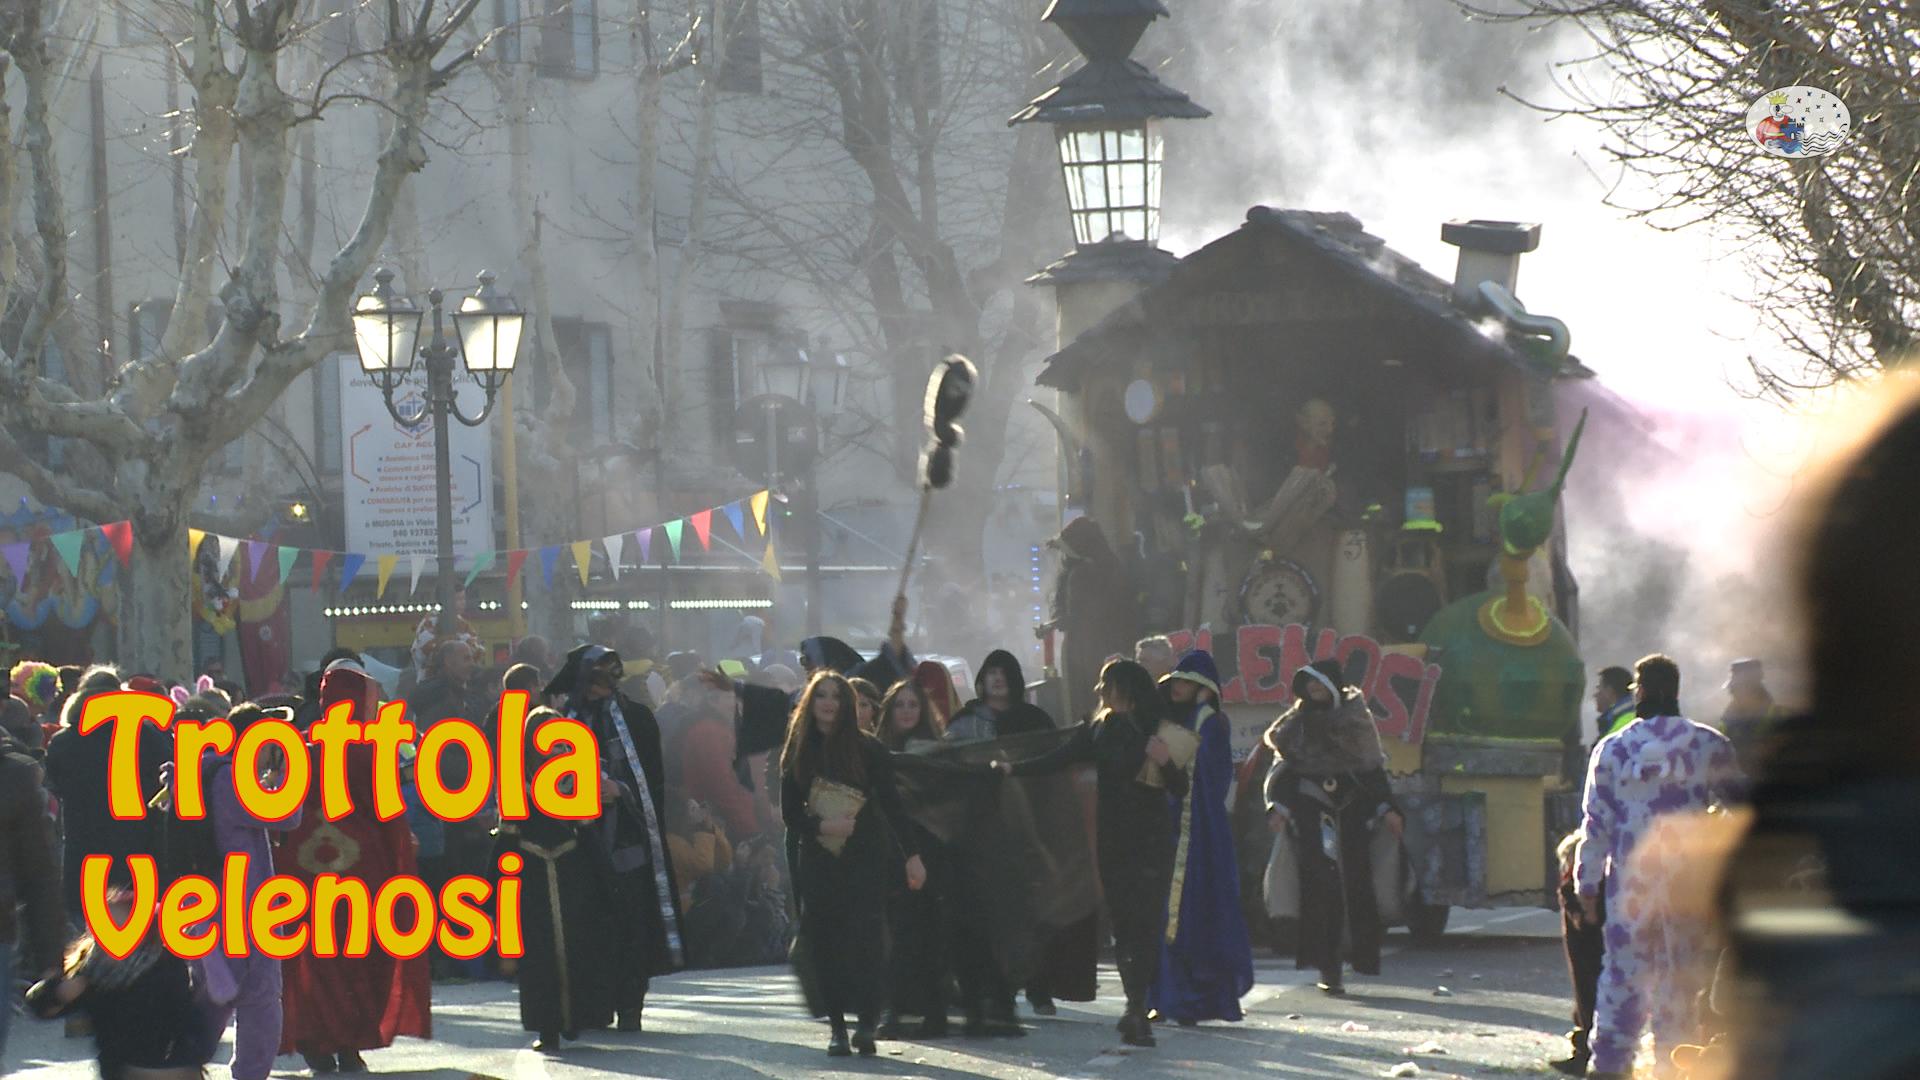 Trottola